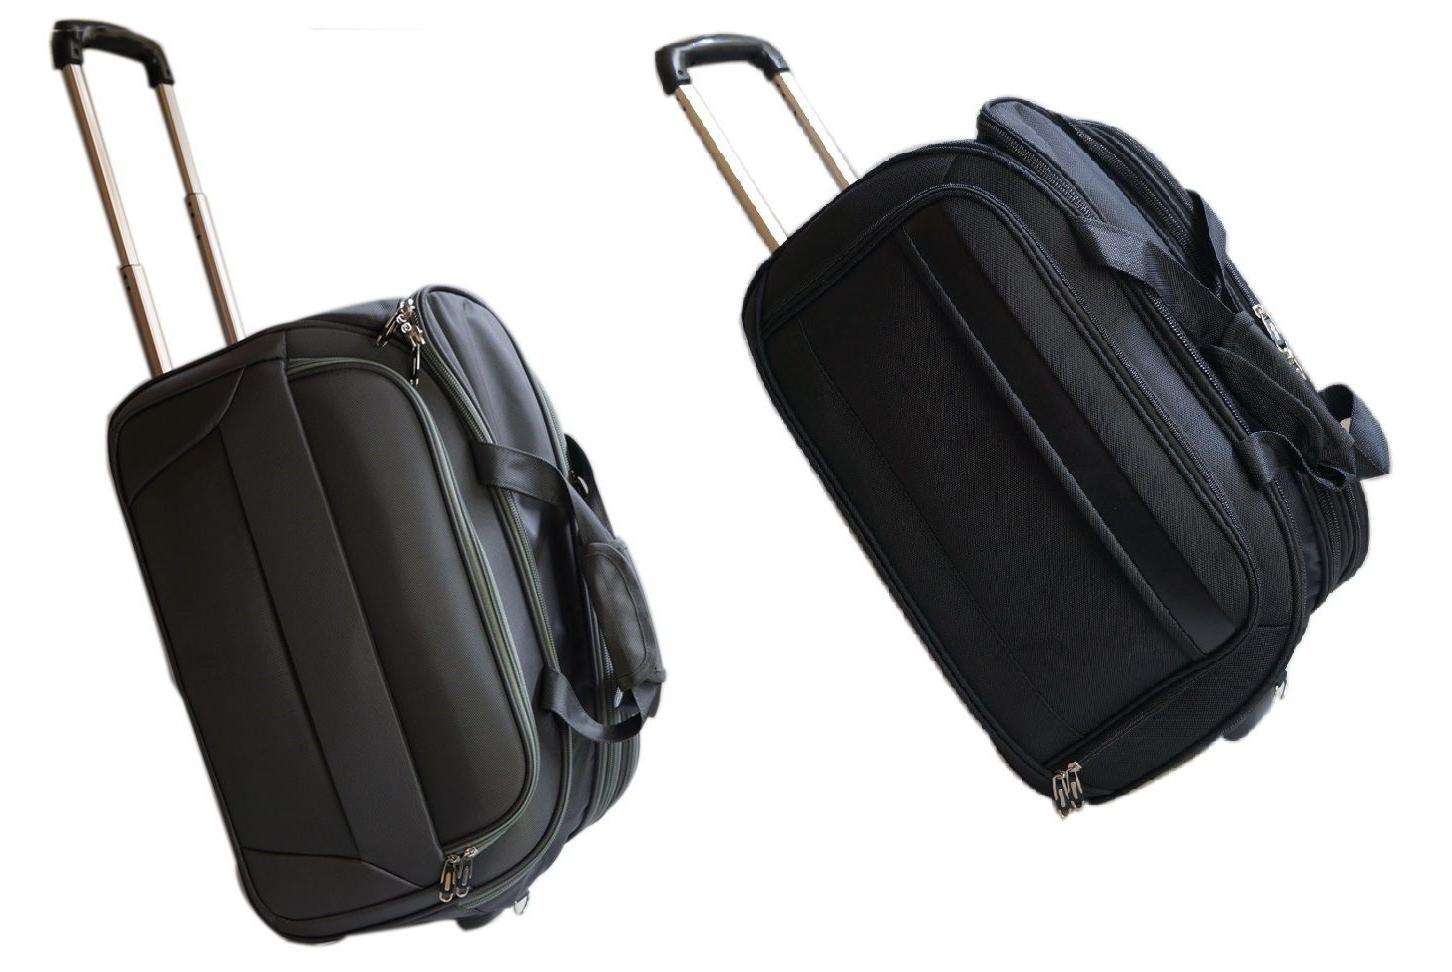 Business Laptop Computer Travel Bag Case Wheeled Luggage Bri